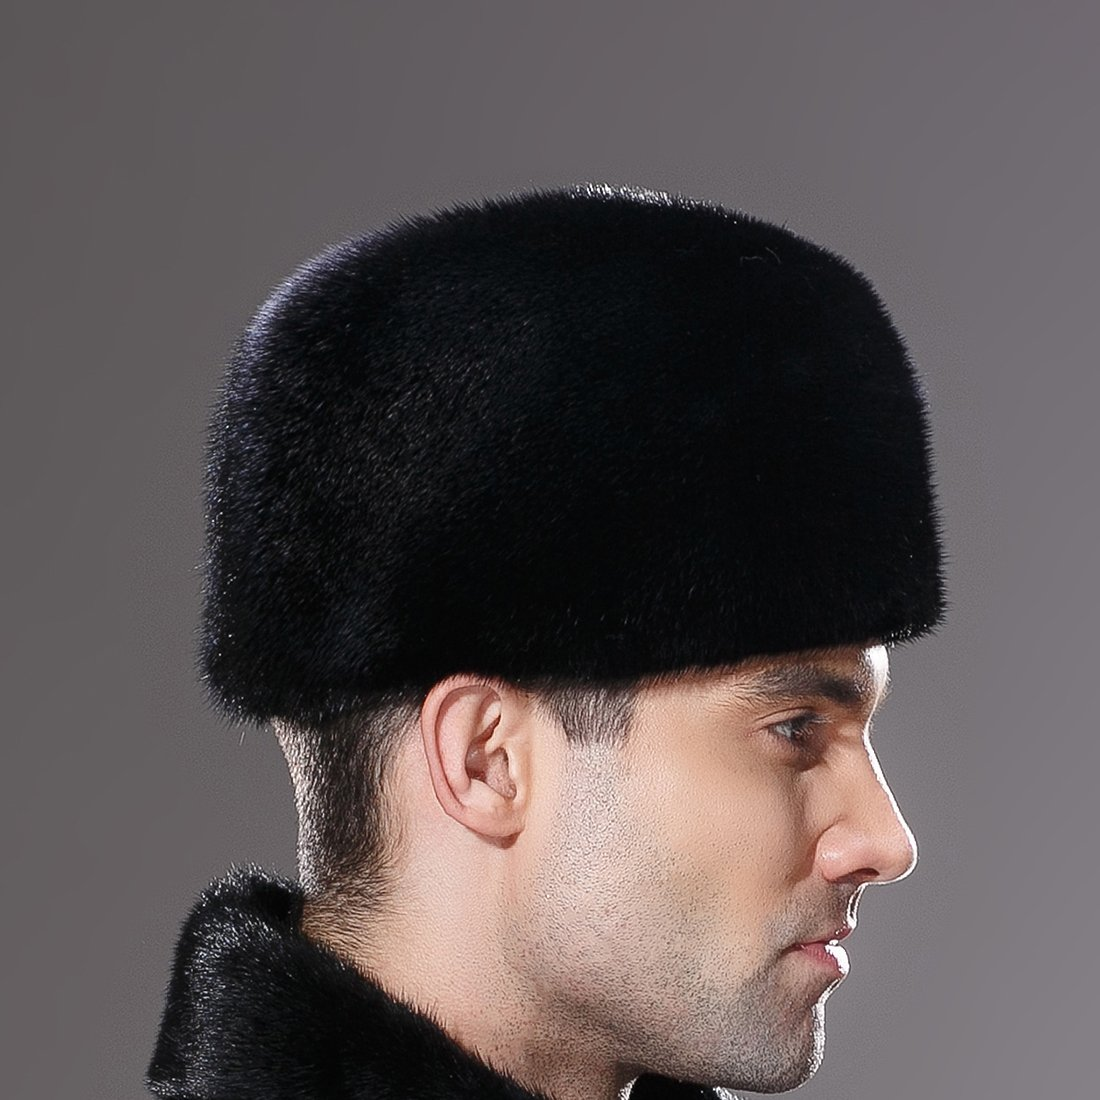 URSFUR Mens Winter Russian Cossack Hat Real Mink Fur Cap Black by URSFUR (Image #5)